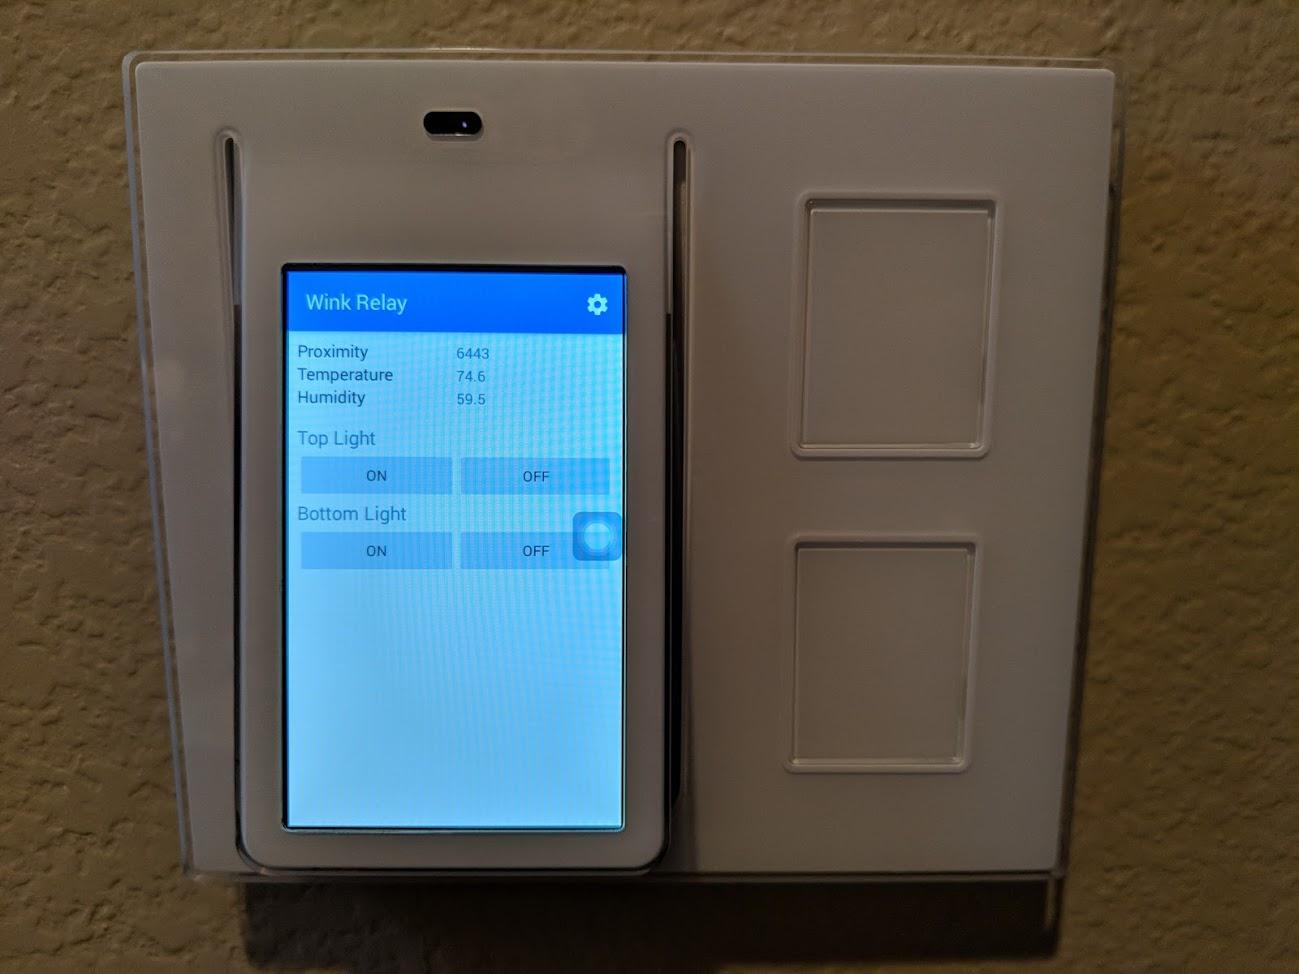 Beta] Wink Relay - LAN Integration - Code Share - Hubitat